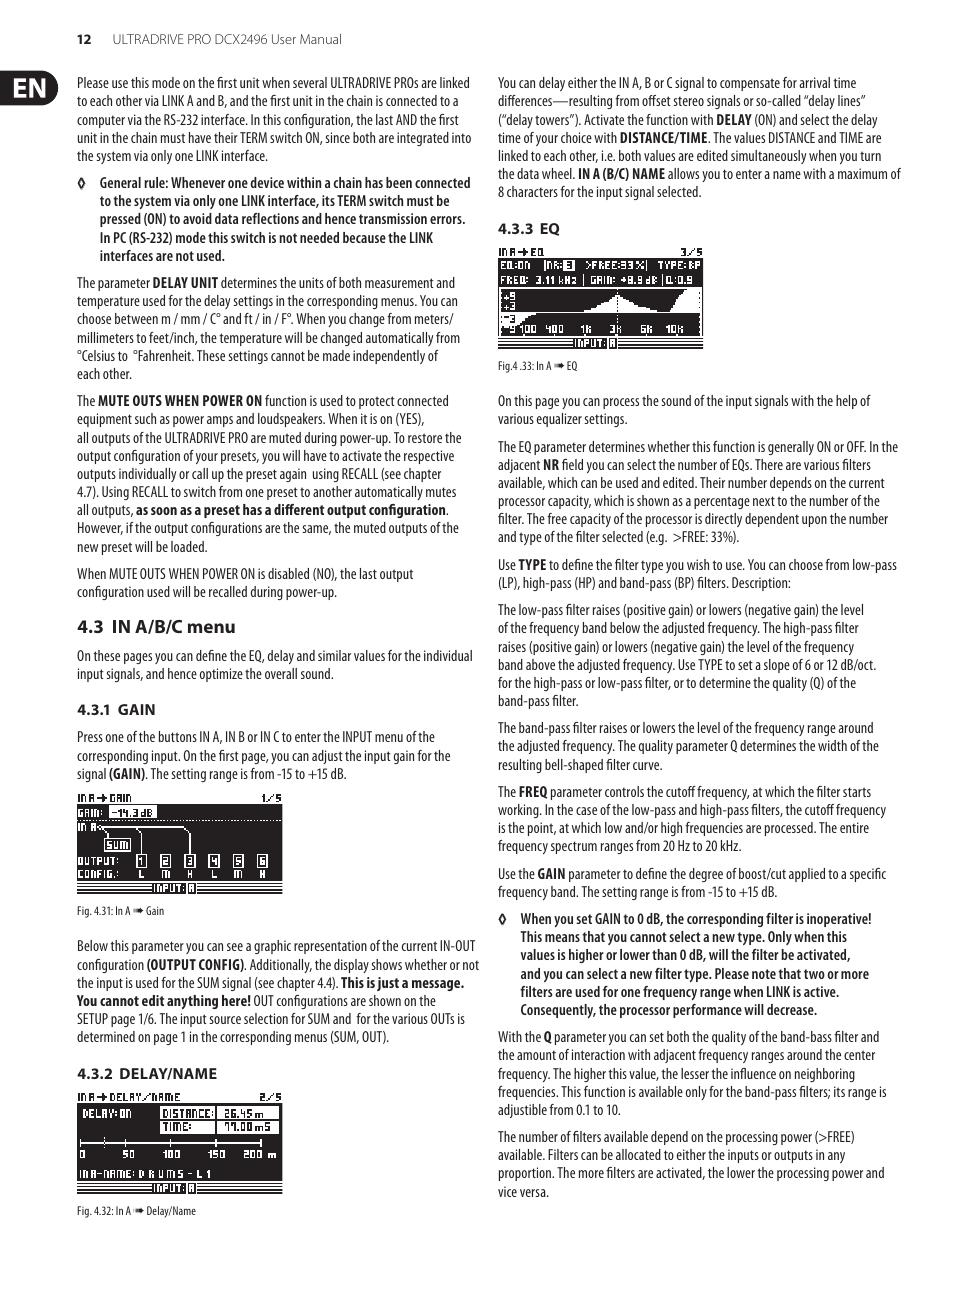 behringer ultradrive pro dcx2496 user manual page 12 35 rh manualsdir com Behringer X32 Mixer Behringer Ultradrive Pro DCX2496 Manual